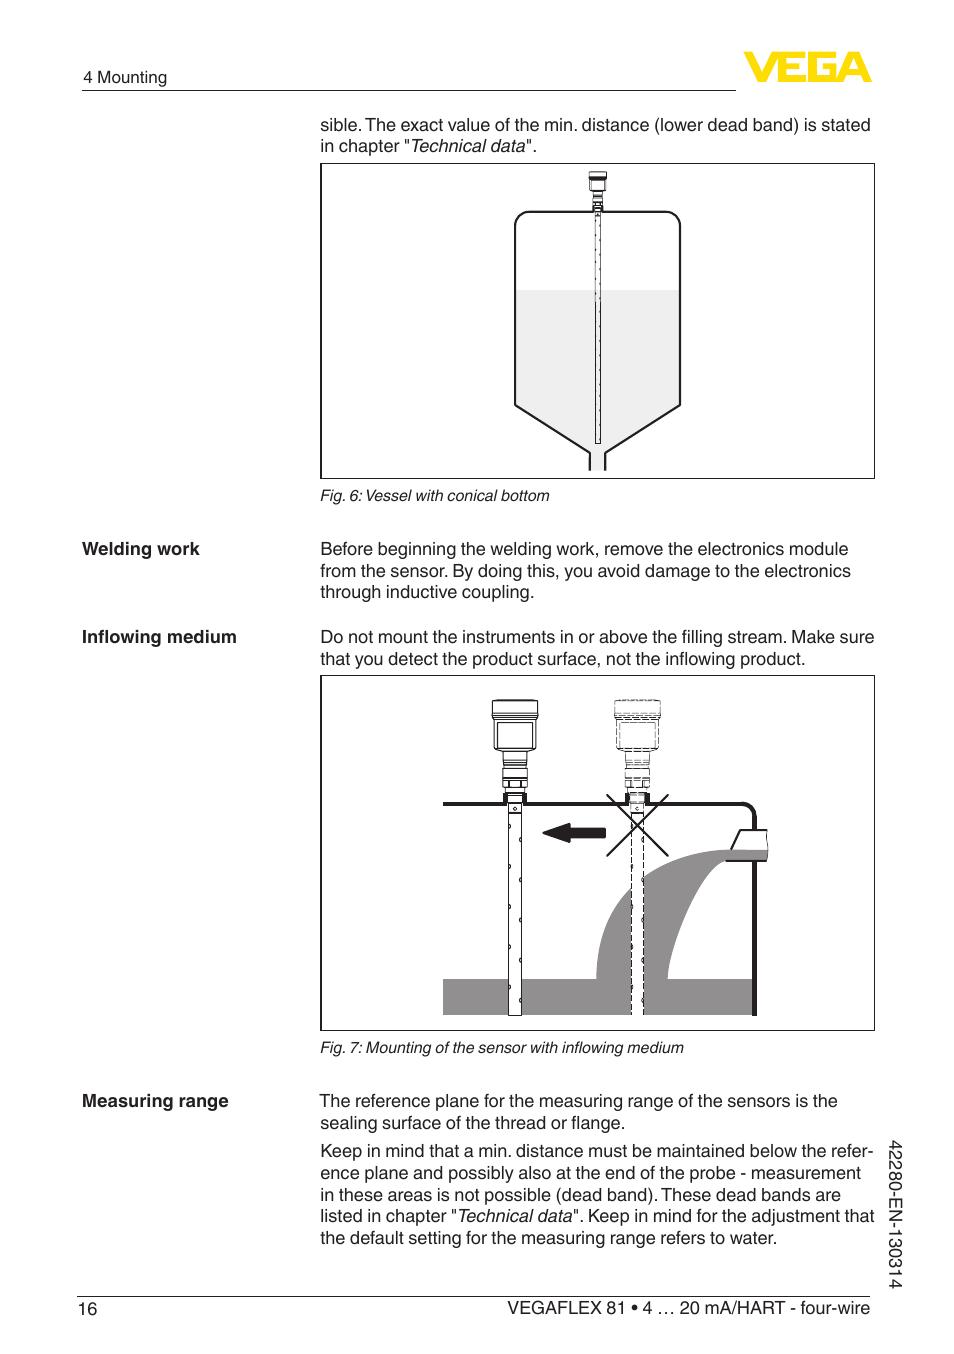 Unimac Wiring Diagram - Wiring Diagram Third Level on marvel wiring diagram, mr steam wiring diagram, sullair wiring diagram, taylor wiring diagram, ge wiring diagram, roper wiring diagram, viking wiring diagram, cleaver brooks wiring diagram, panasonic wiring diagram, rex wiring diagram, primus wiring diagram, american wiring diagram, coleman wiring diagram, danby wiring diagram, rockwell wiring diagram, braun wiring diagram, general wiring diagram, dexter wiring diagram, wascomat wiring diagram, ingersoll rand wiring diagram,